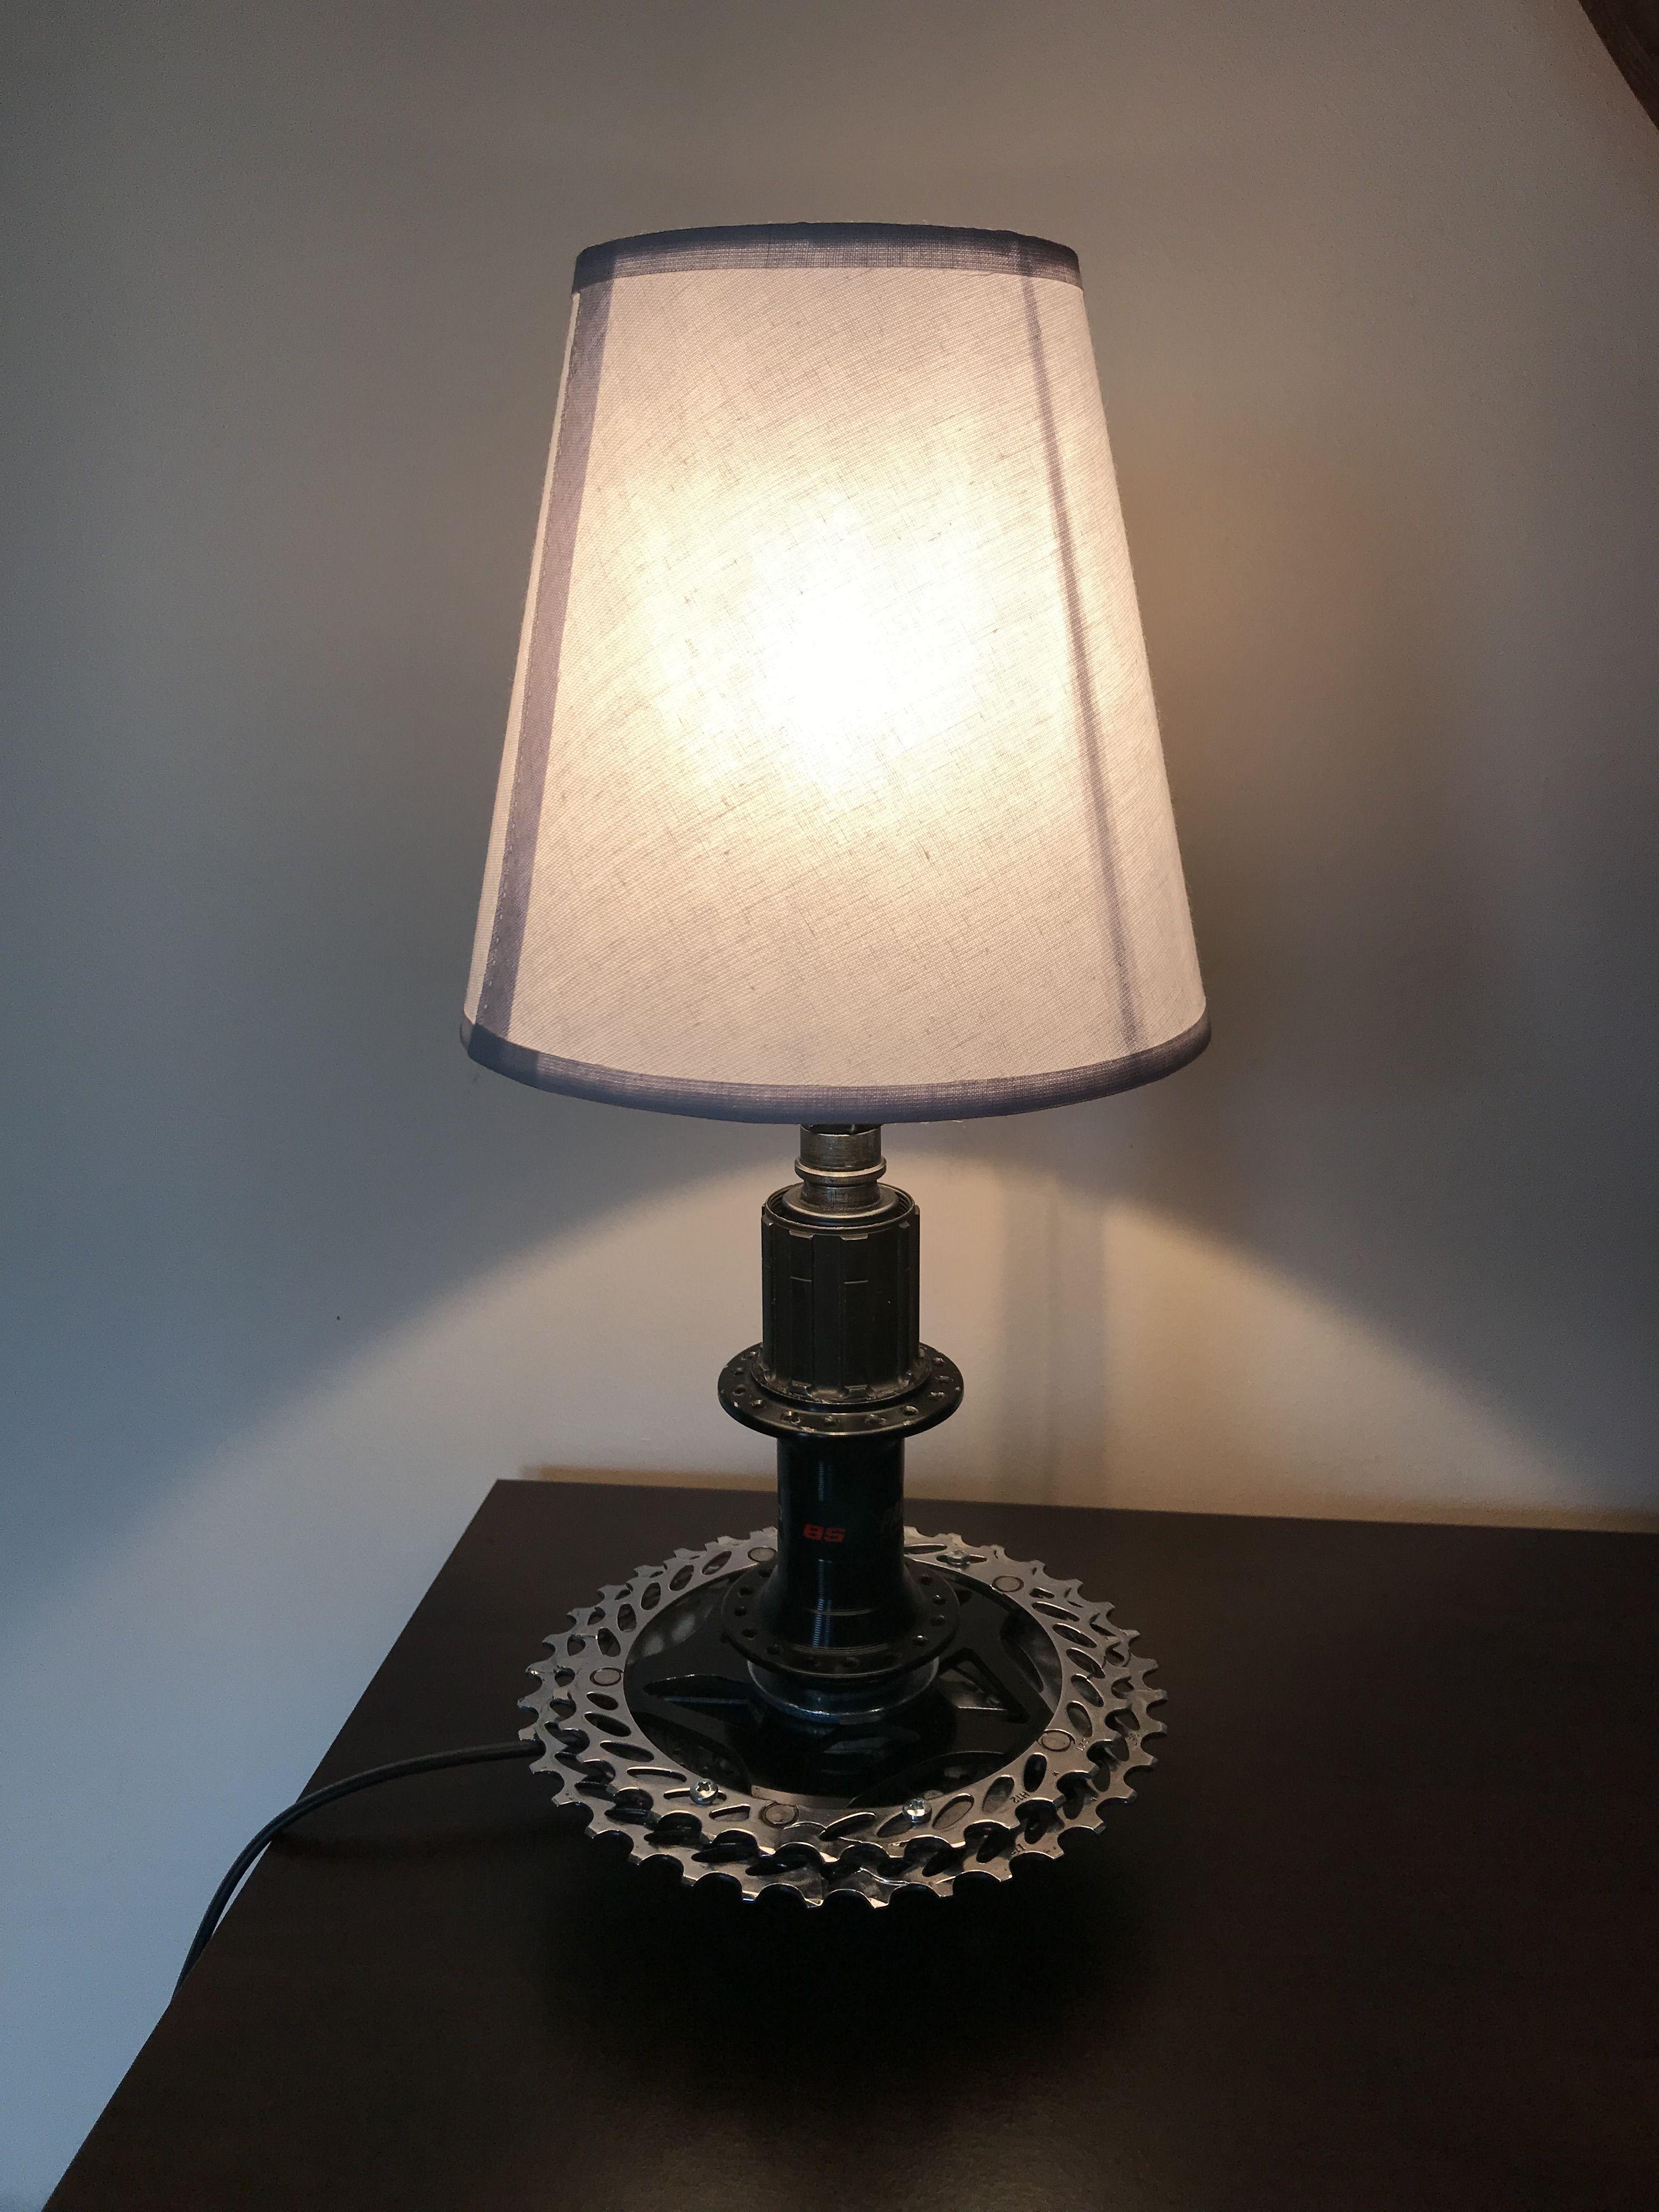 Table Lamp Lantern Bike Gear Lantern Lamp Vintage Lamp Etsy In 2020 Table Lamp Lamp Vintage Lamps